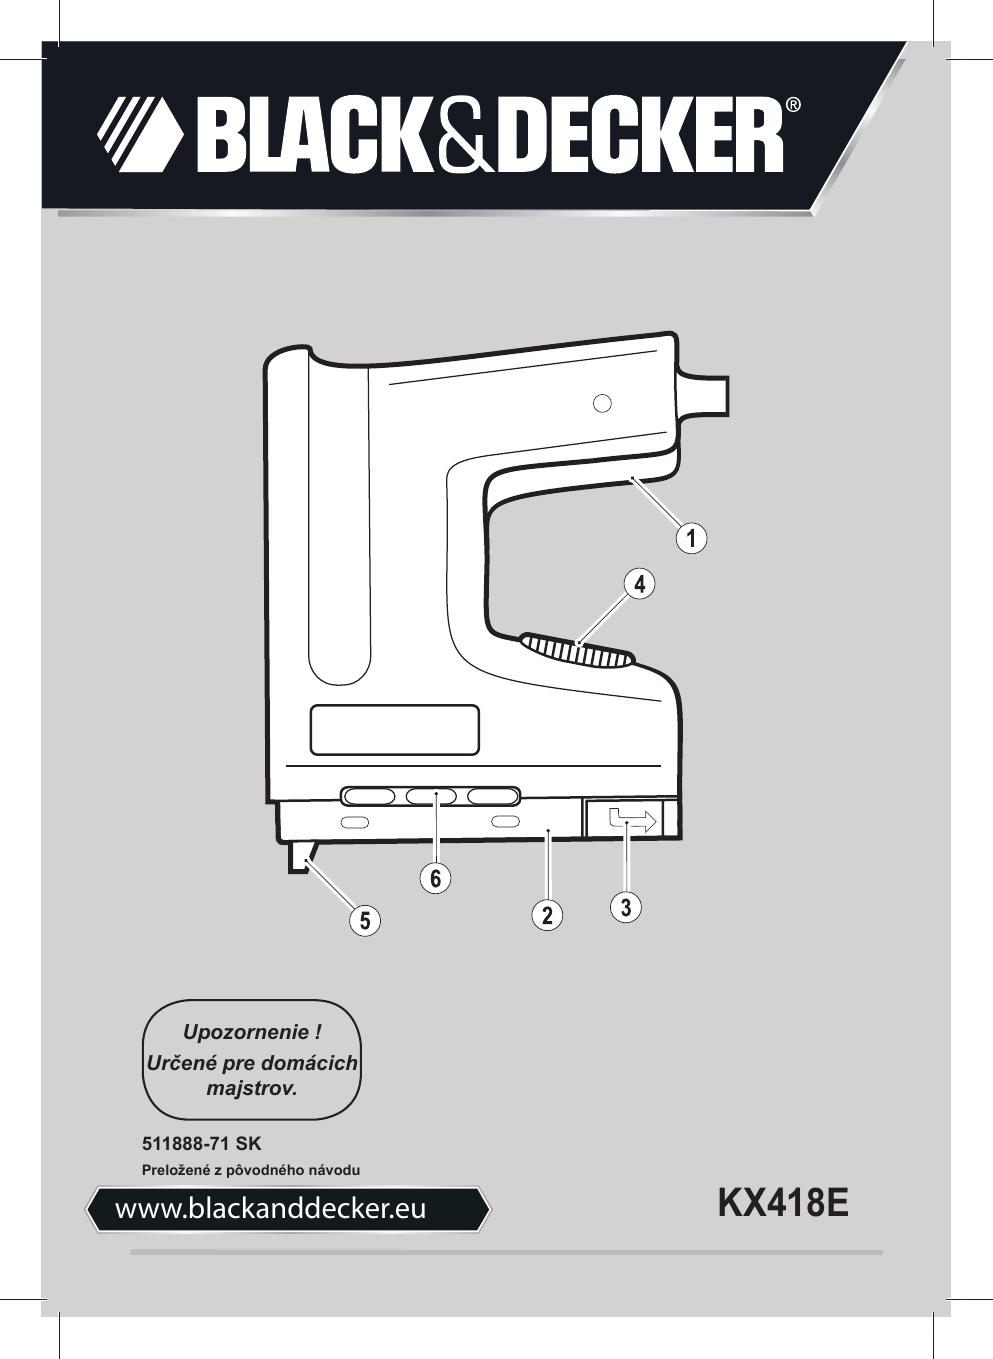 Black&Decker KX418E TACKER Type 2 instruction manual